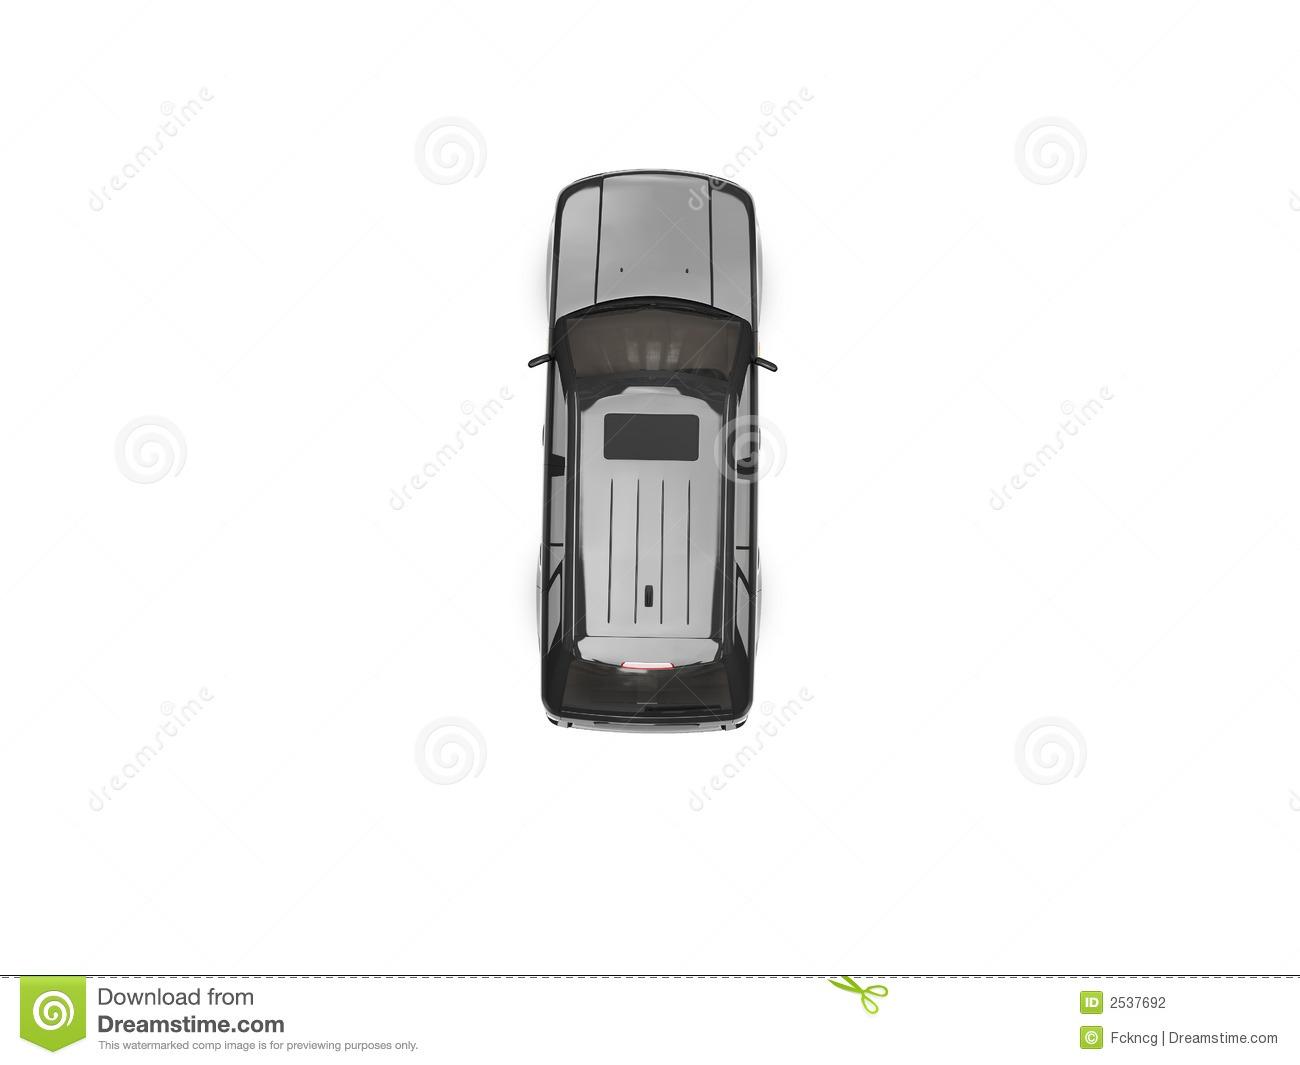 Isolated black car top. Auto von oben clipart